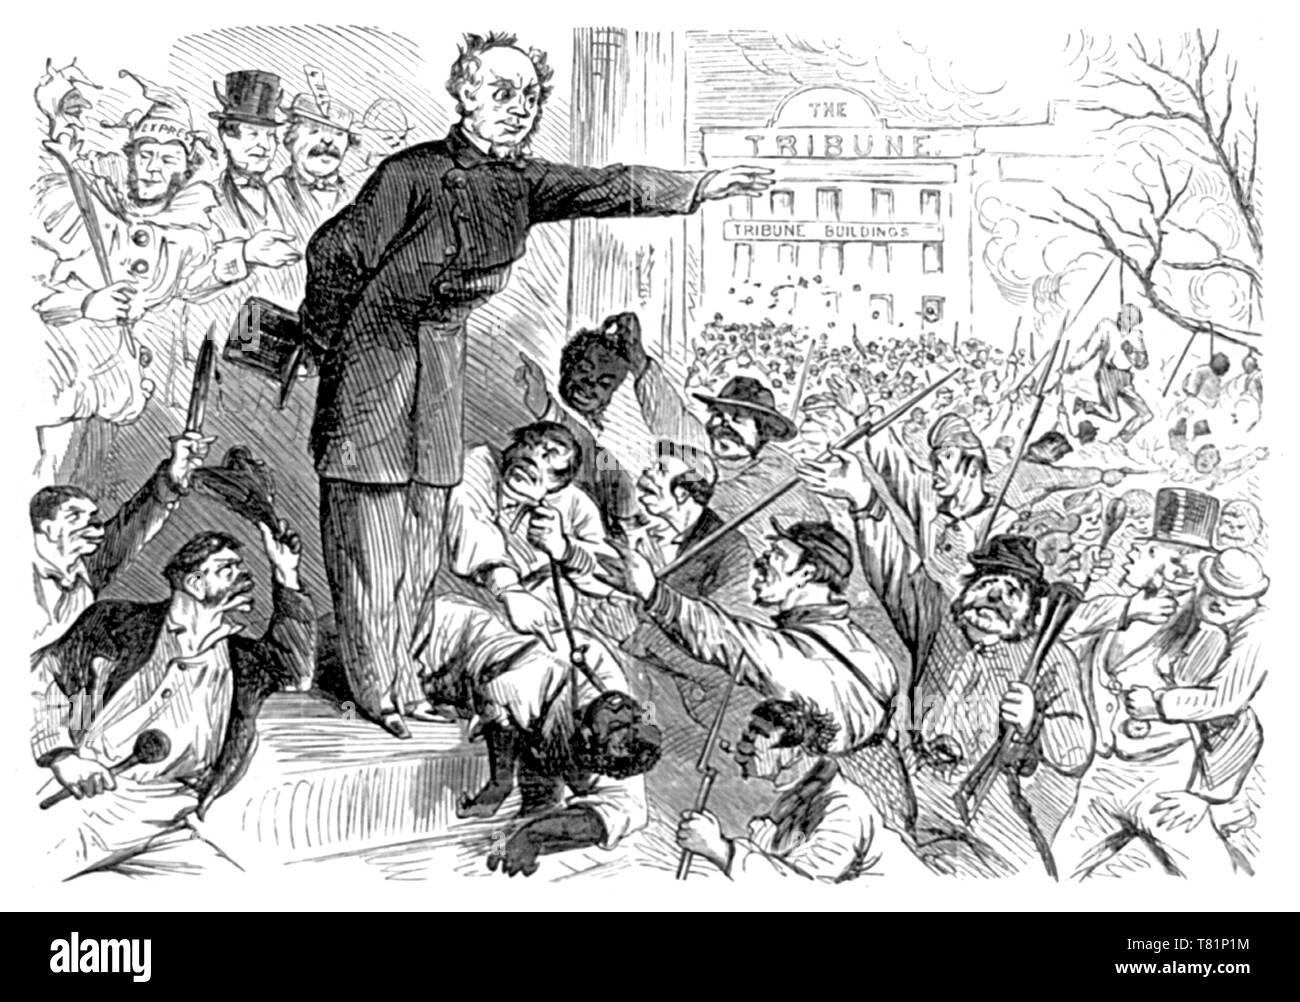 NYC Draft Riots, Governor Horatio Seymour, 1863 - Stock Image